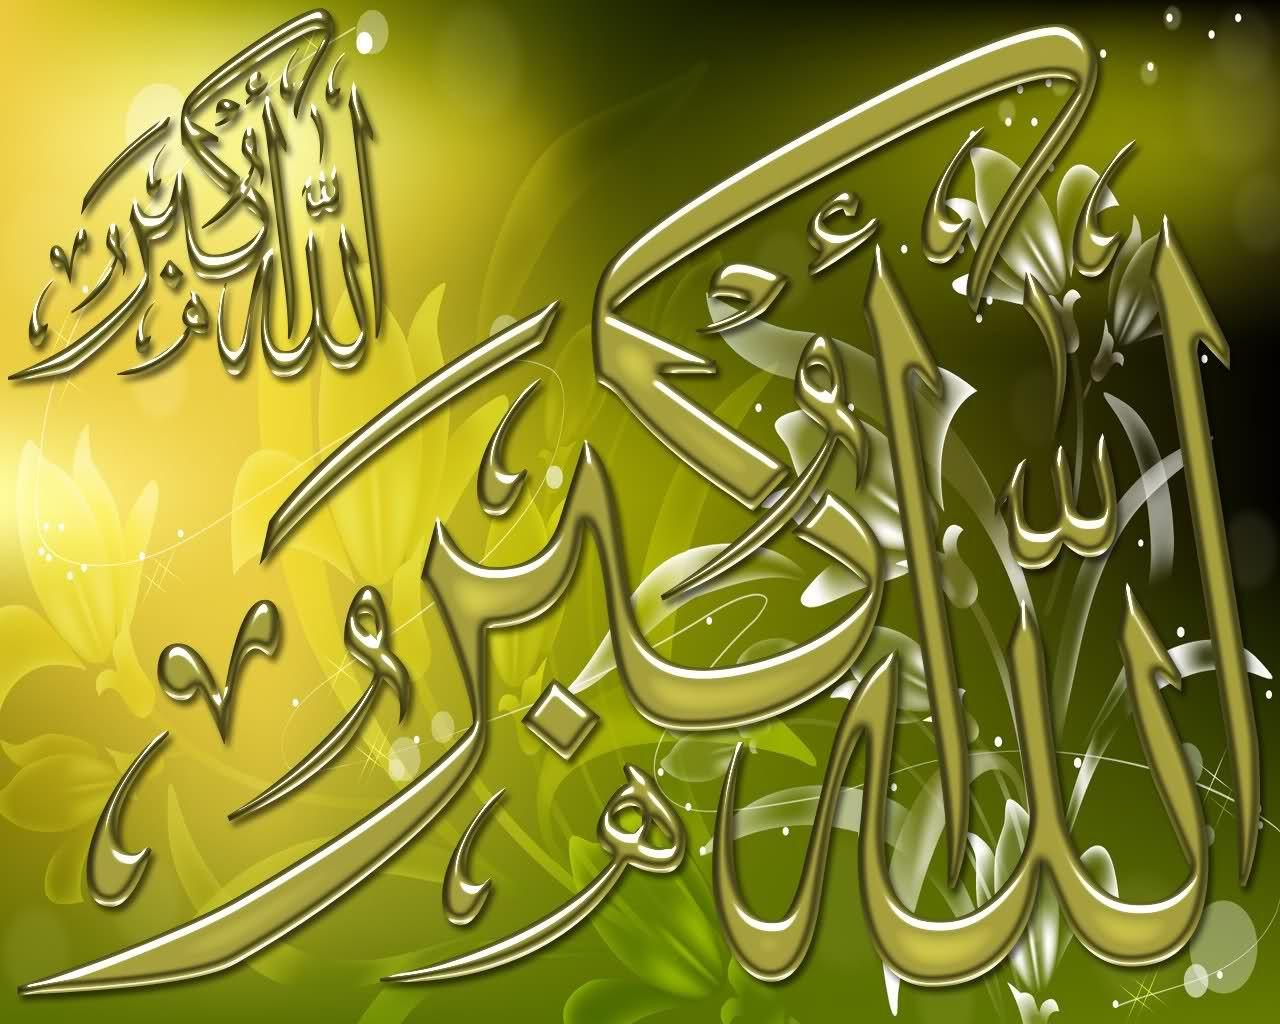 allah ho akbar hd wallpaper hd wallpapers islamic wallpaper islamic art calligraphy